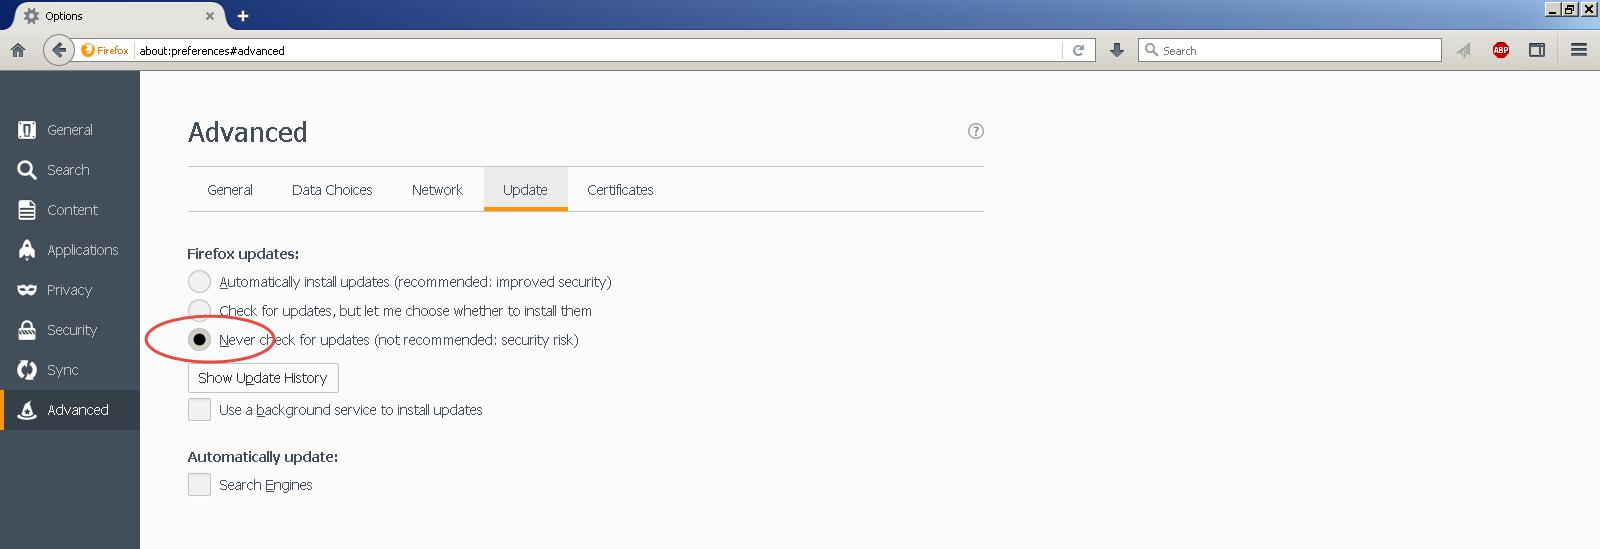 disable Firefox updates